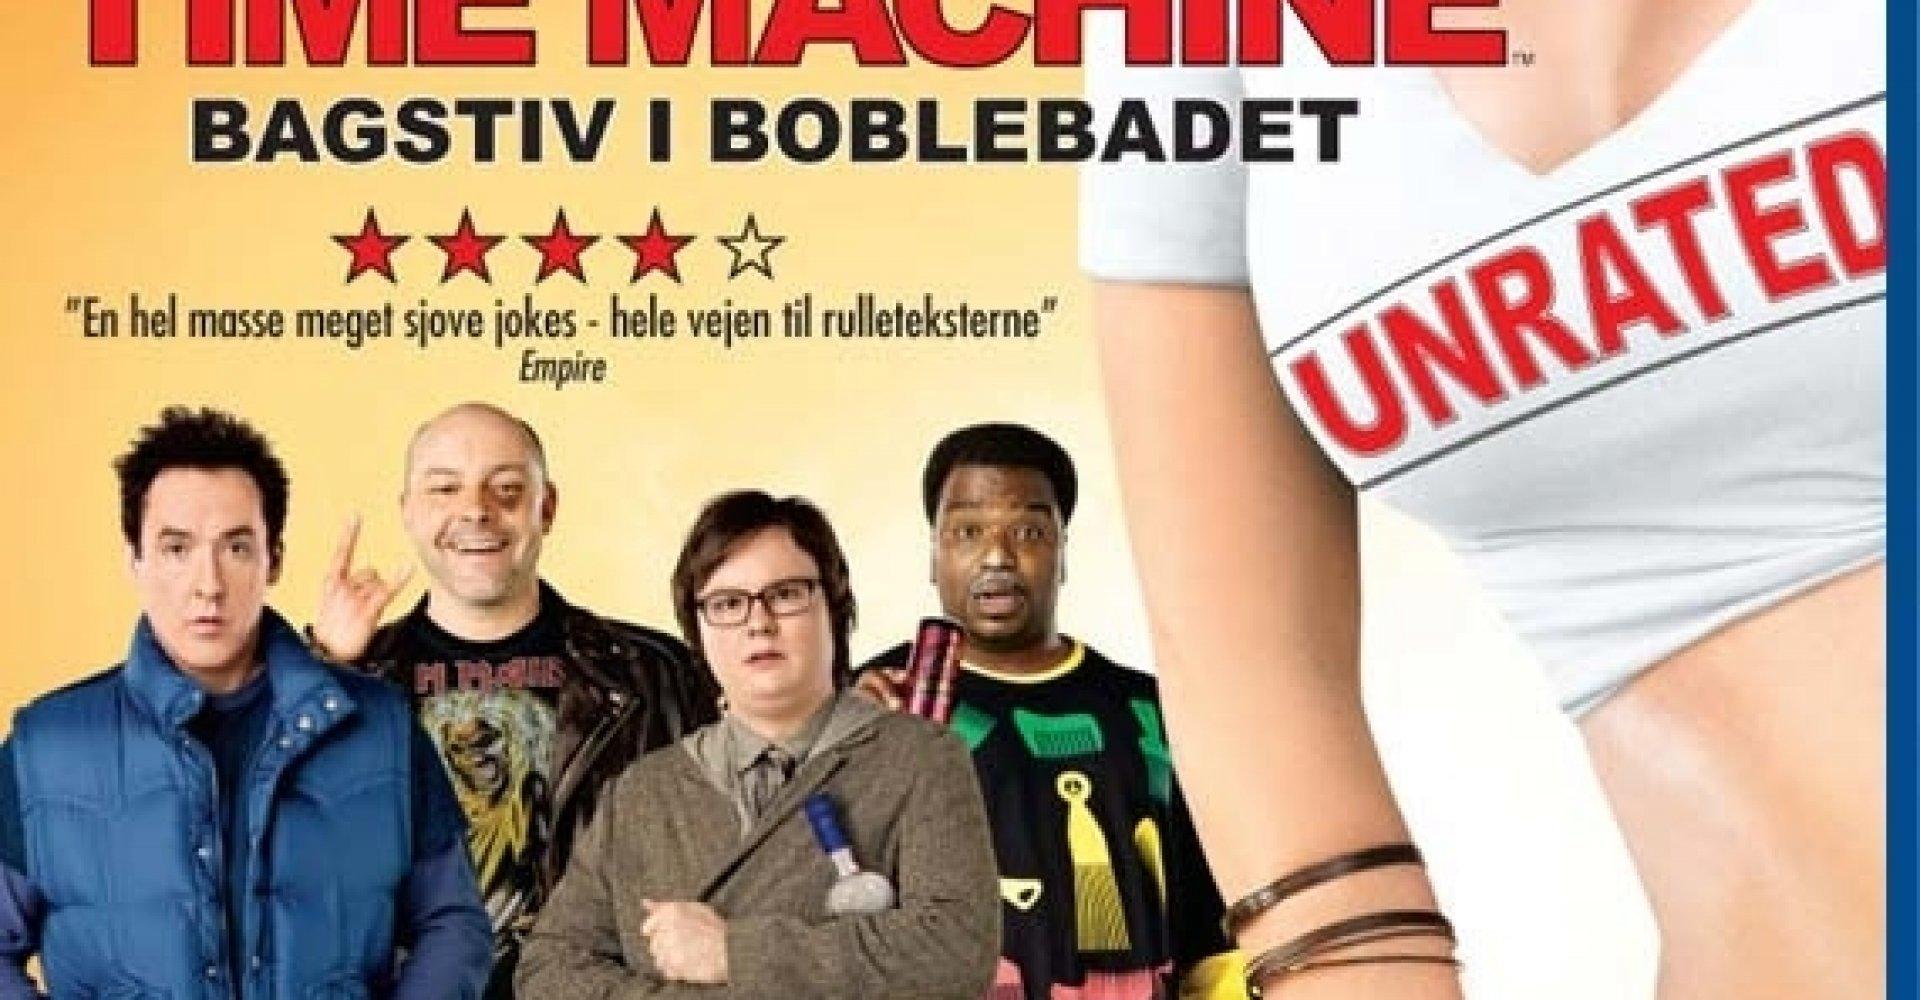 Hot Tub Time Machine - På Blu-ray og dvd | Connery